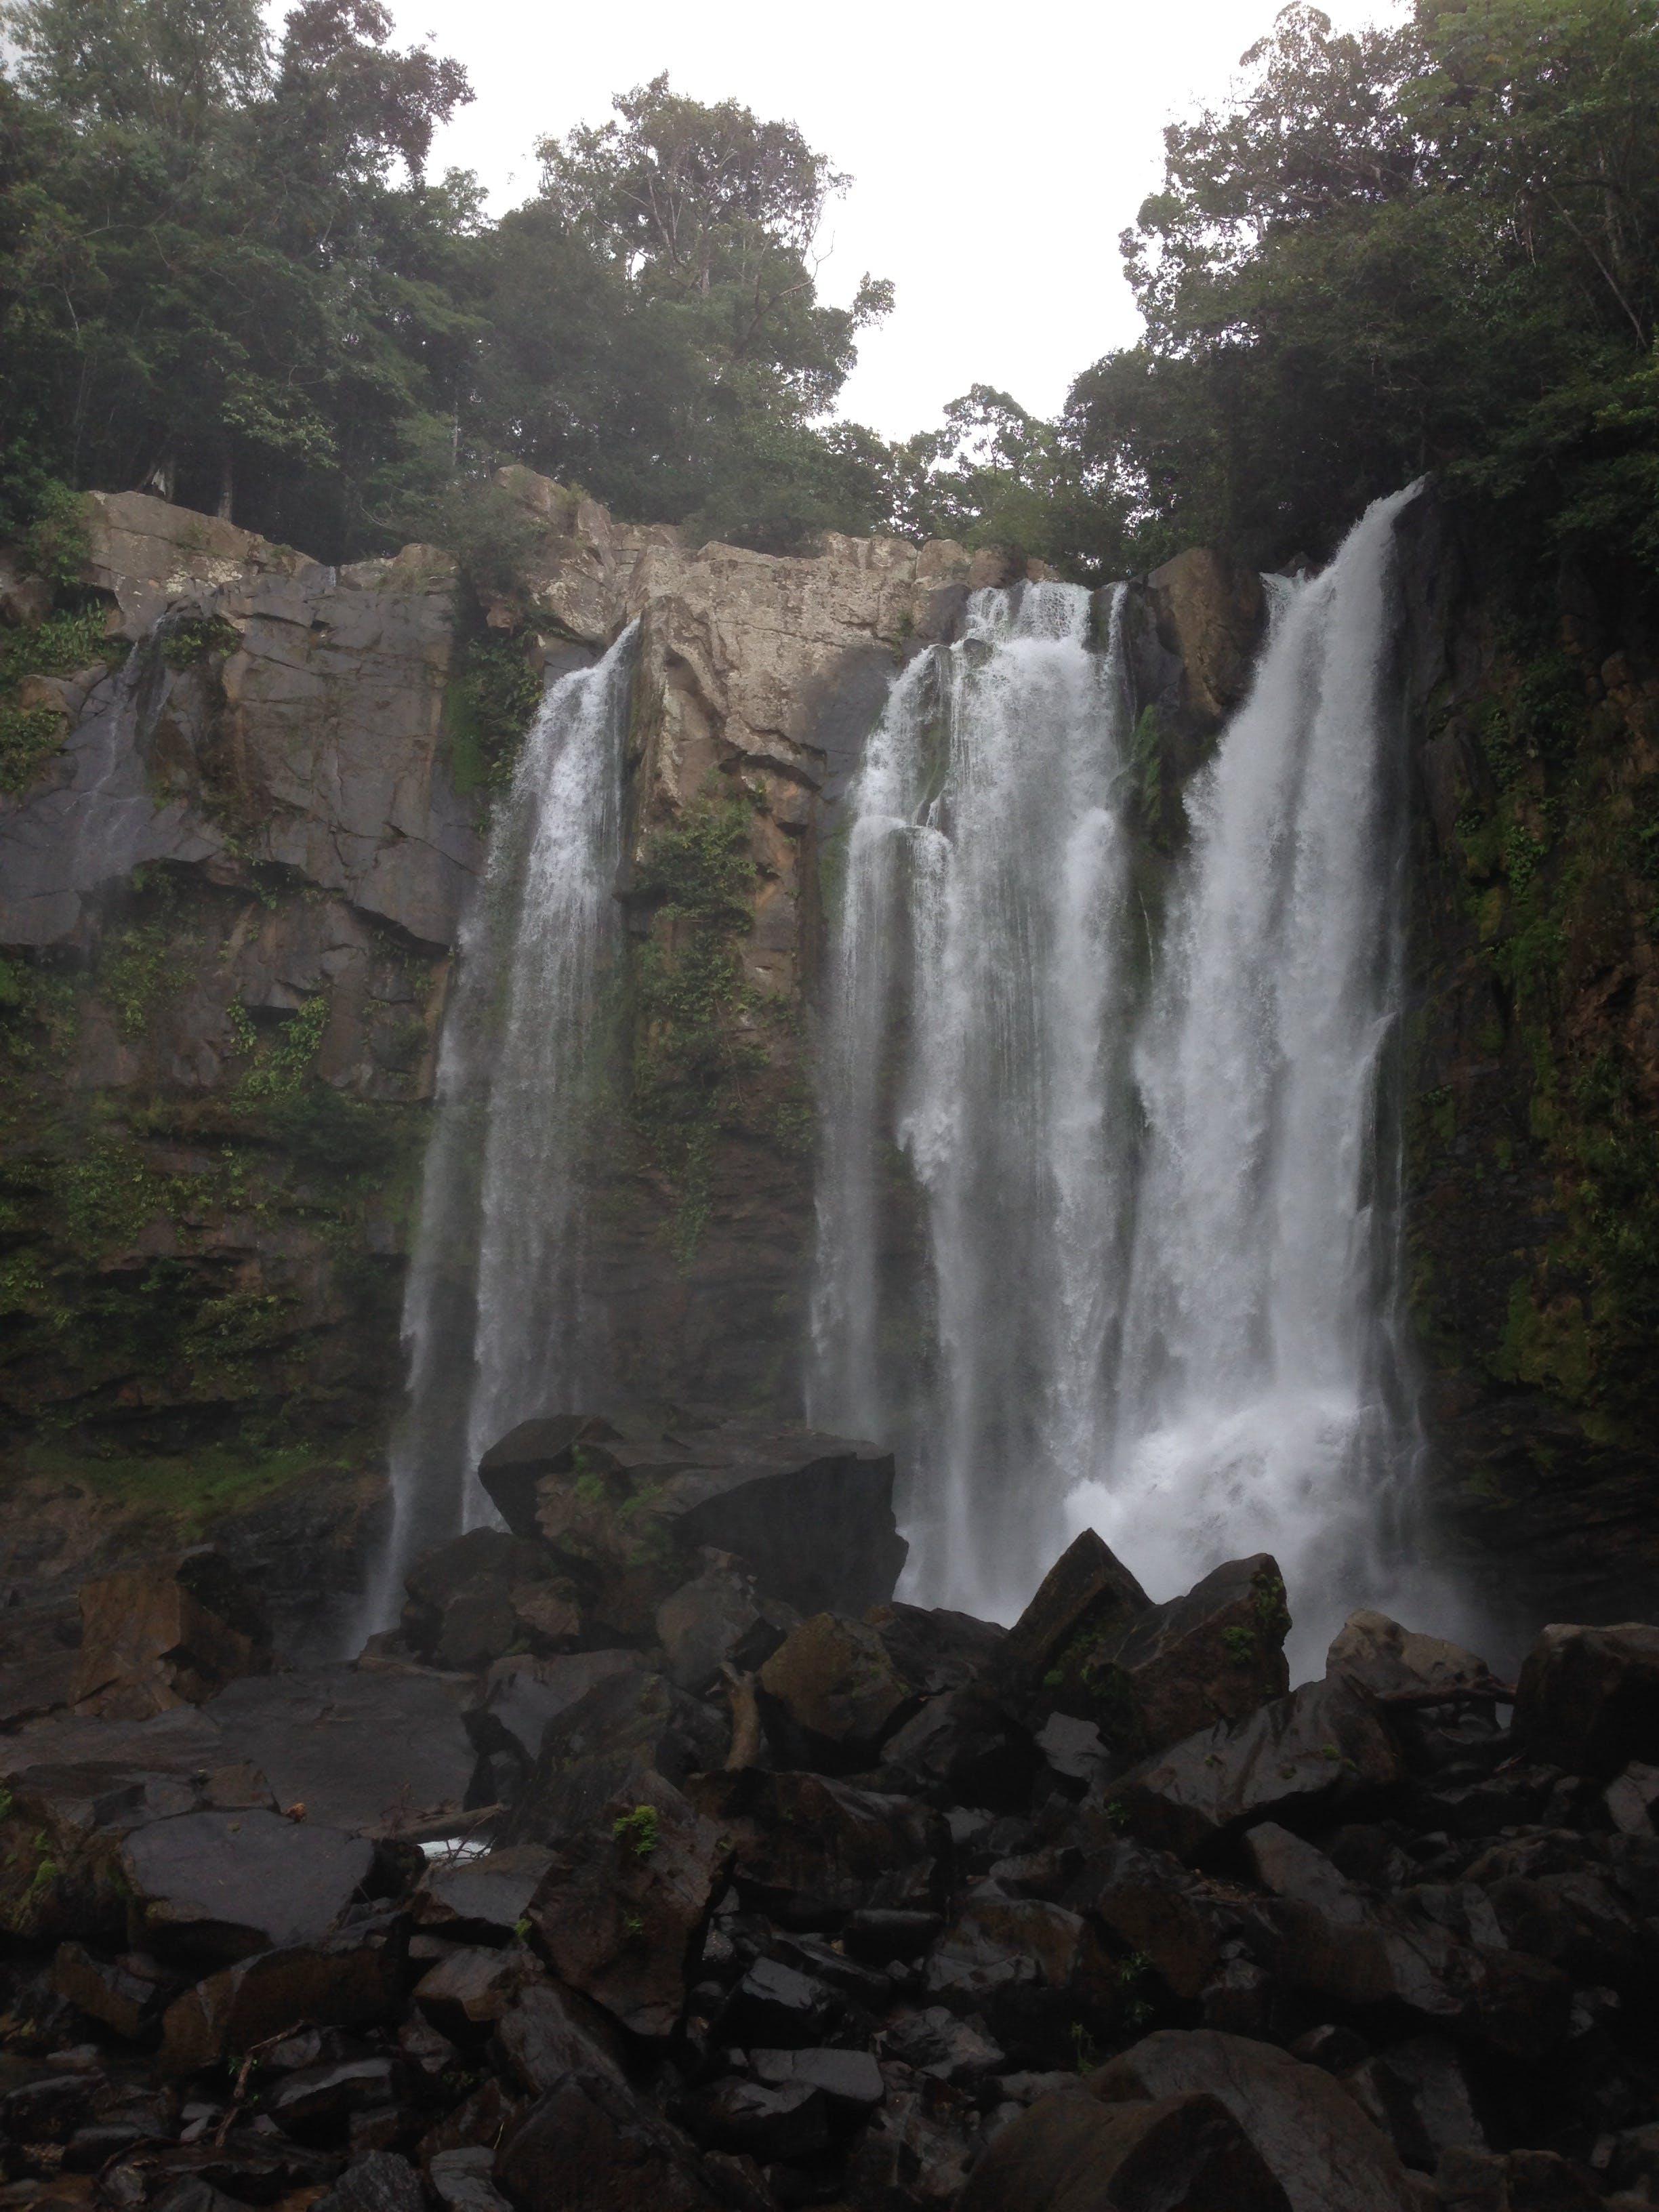 Free stock photo of Costa Rica, river, waterfall